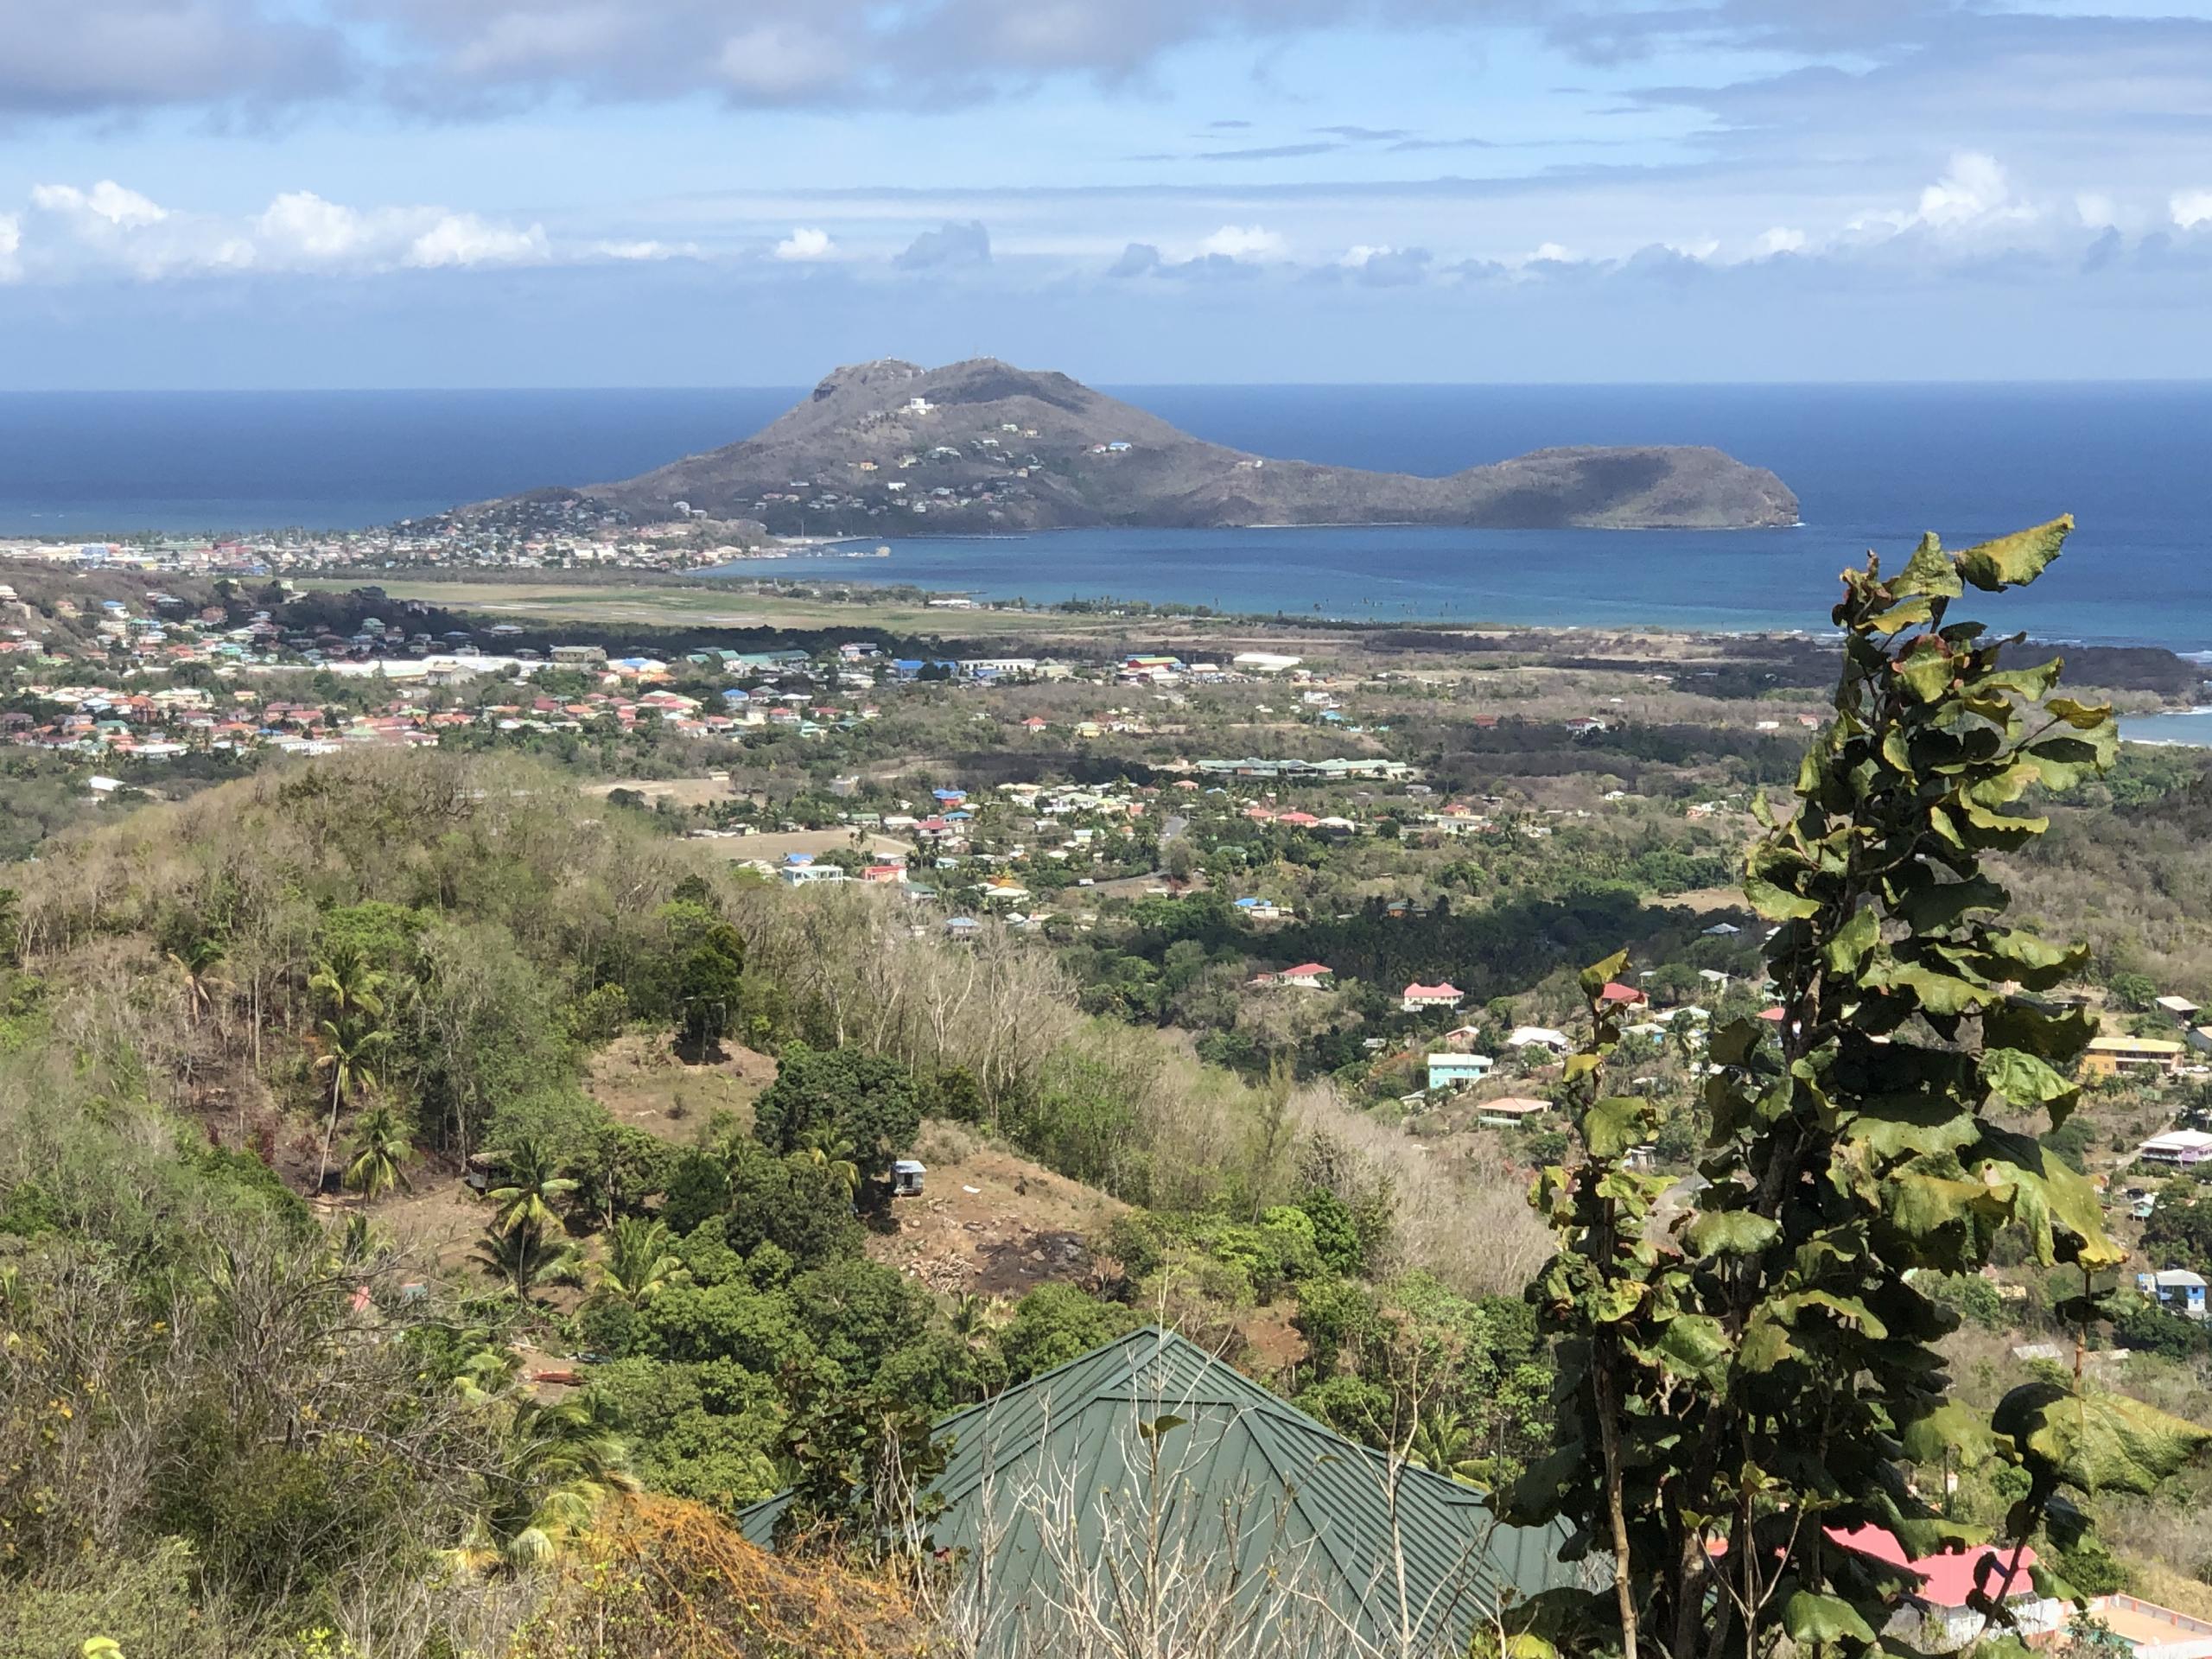 Laborie, St Lucia Morne LeBlanc Land For Sale 22,375 sq ft.